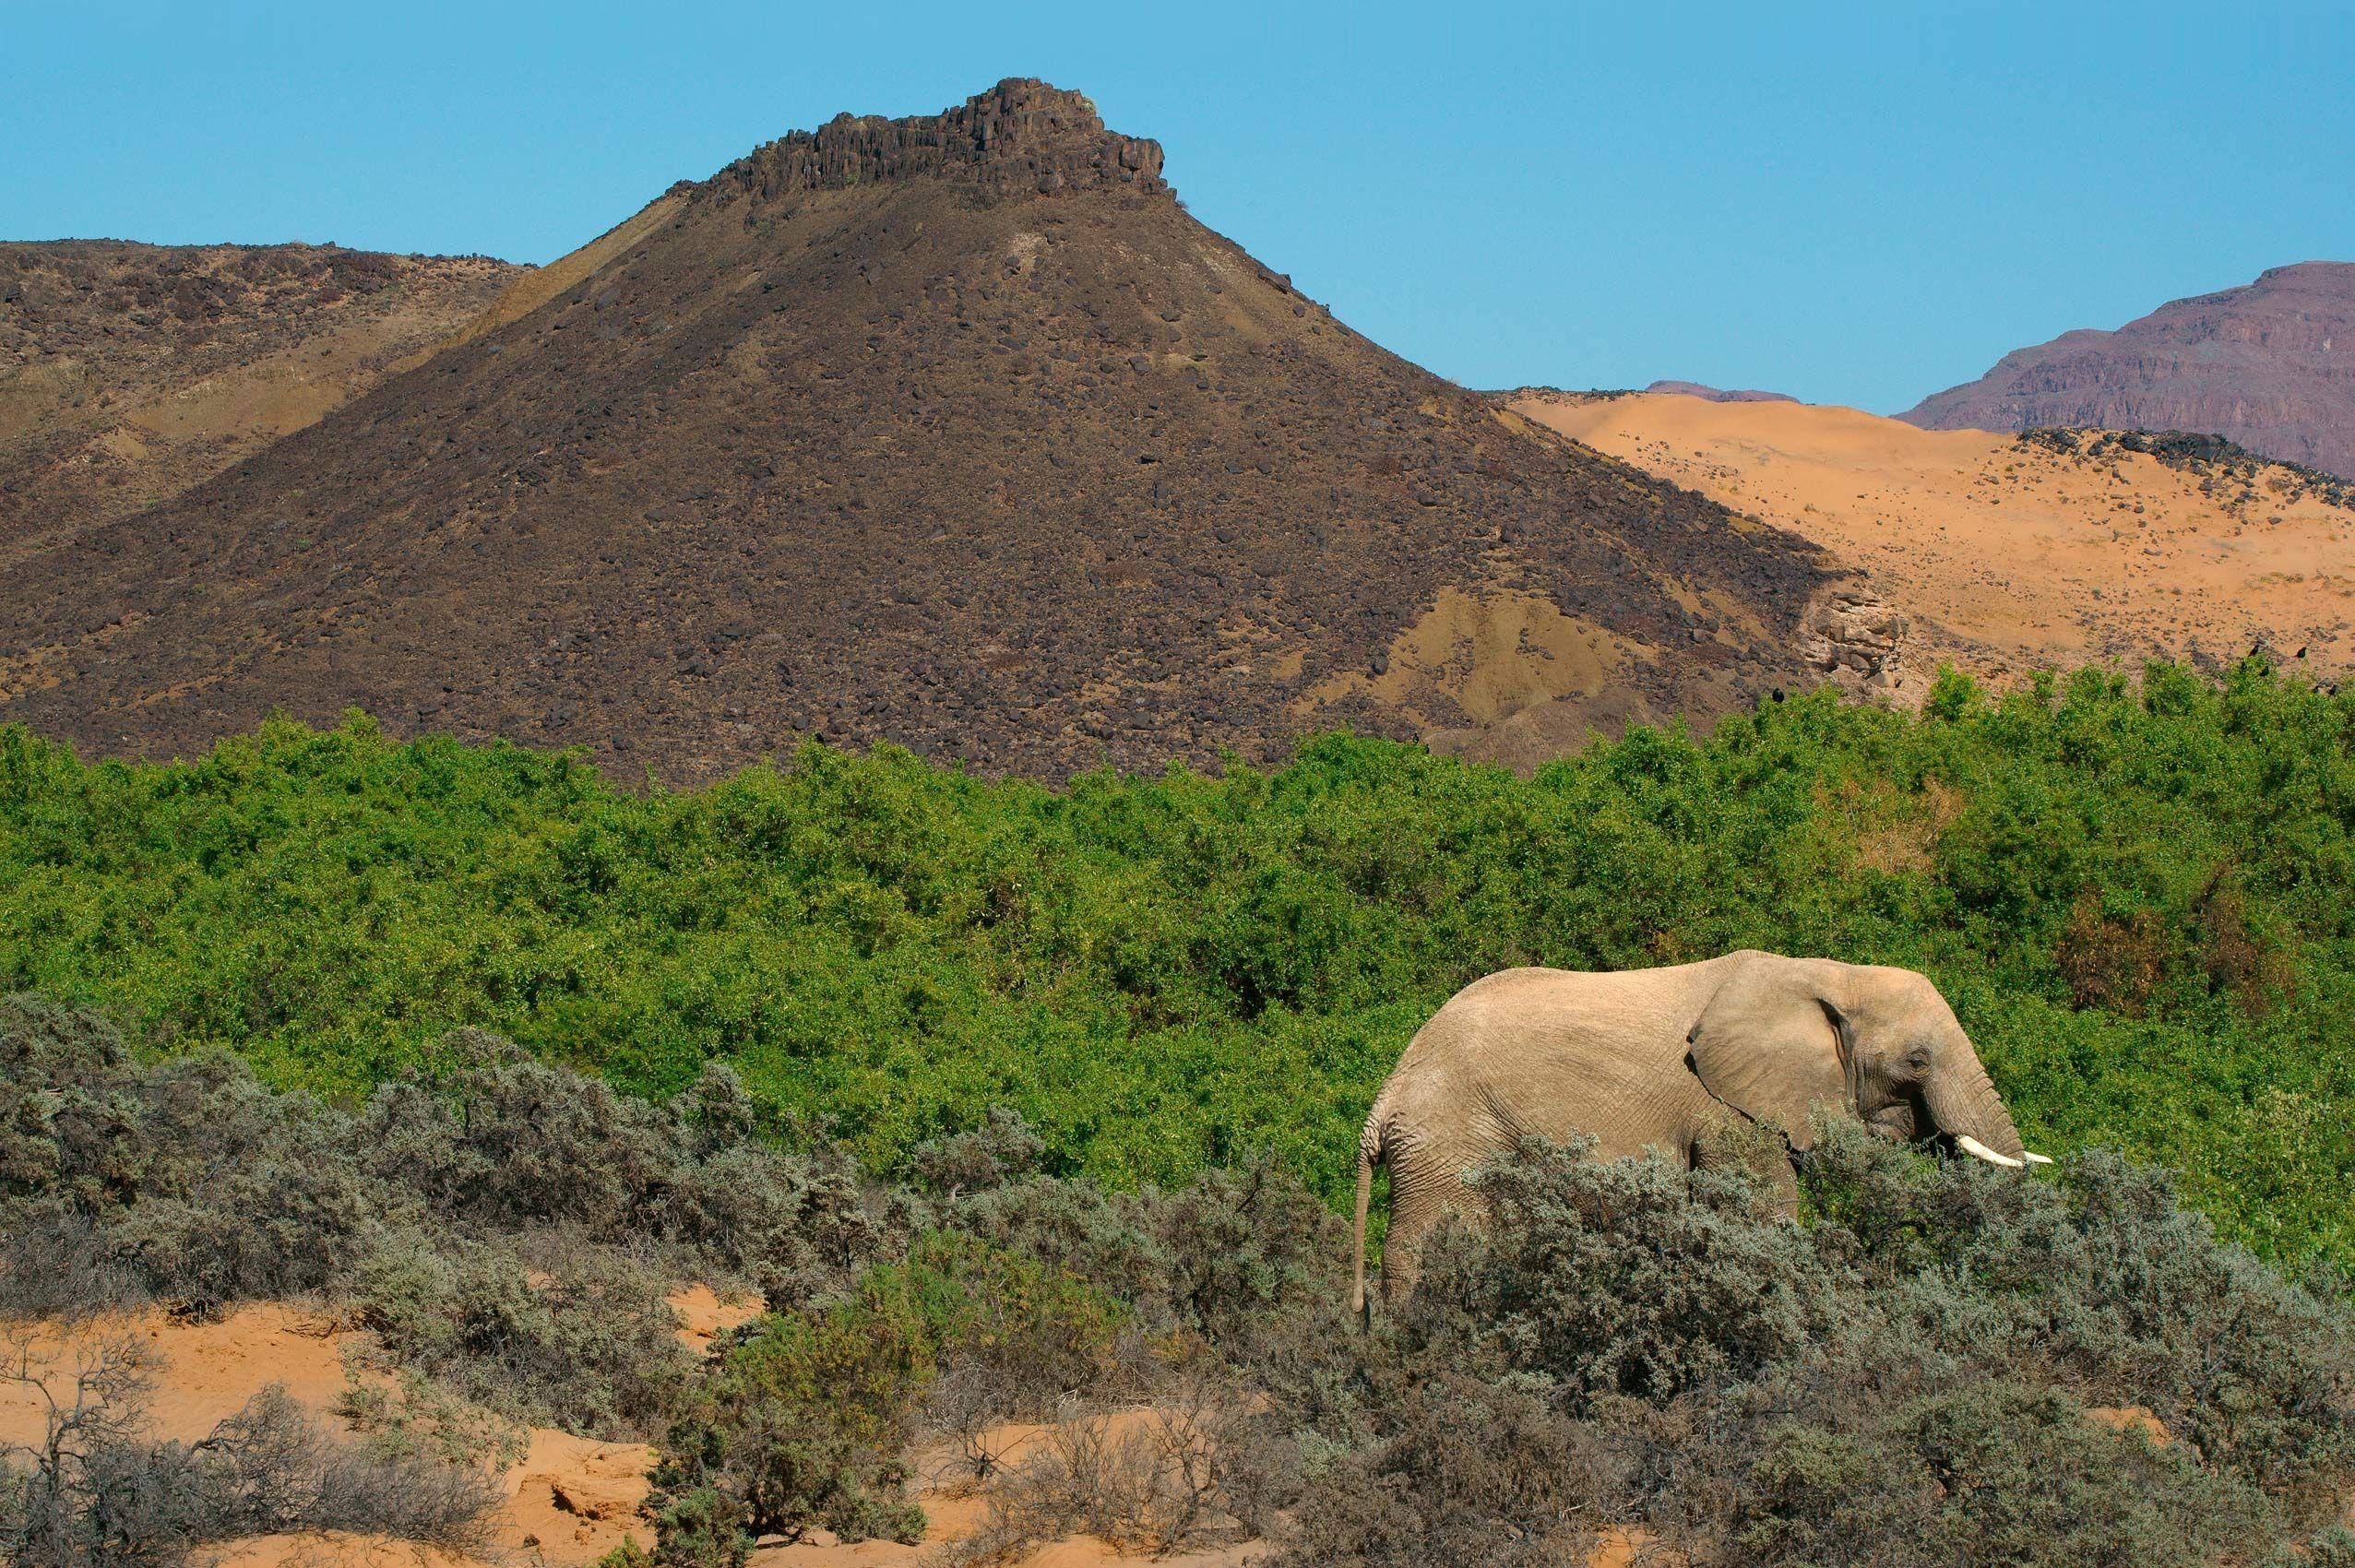 Elephant and Greenery